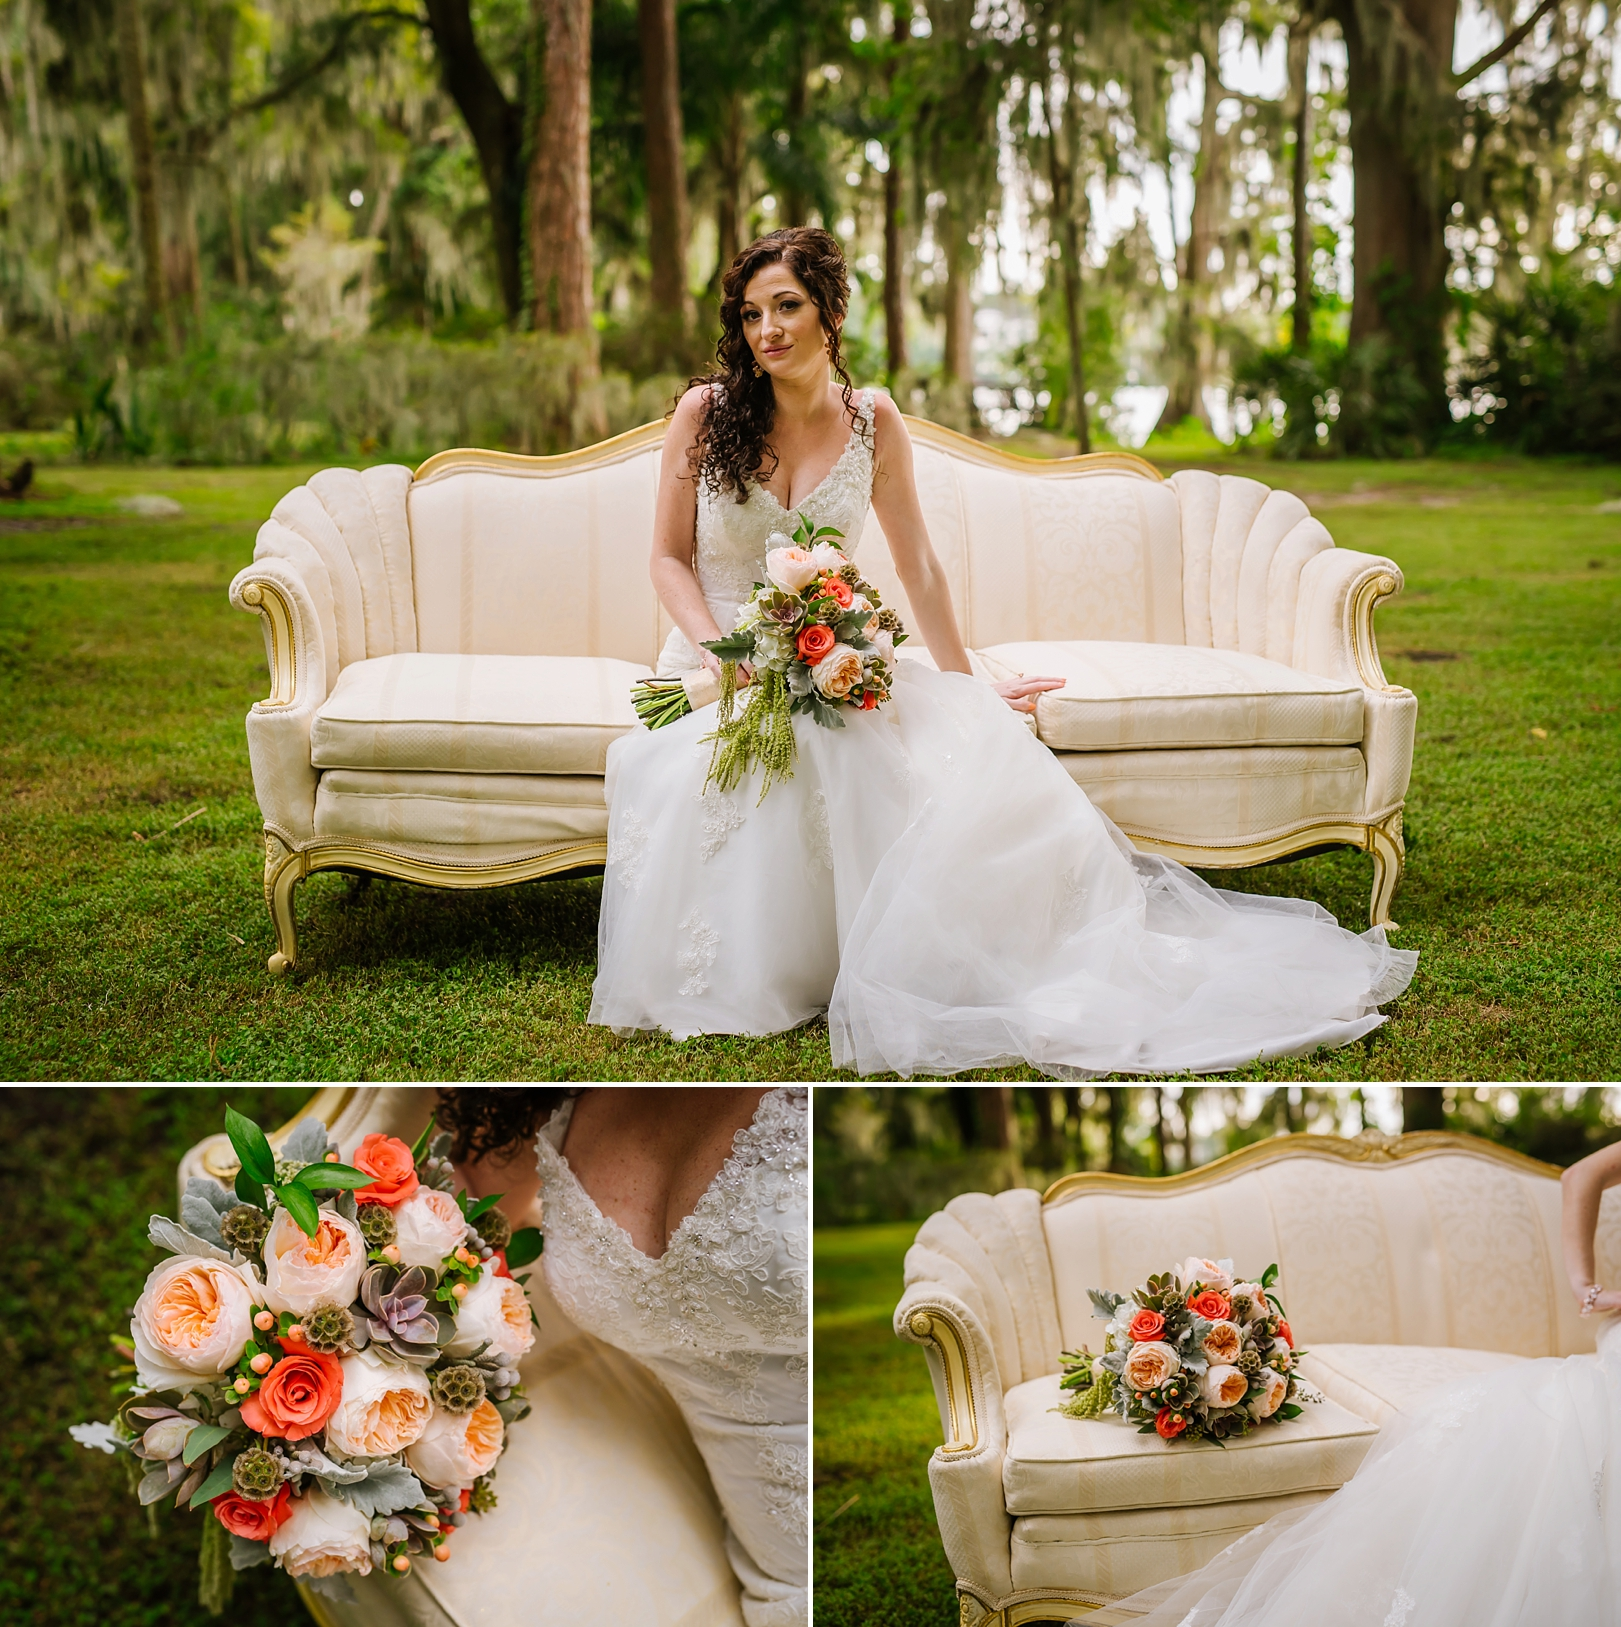 kraft-azalea-gardens-stylish-elopment-wedding-photography_0018.jpg